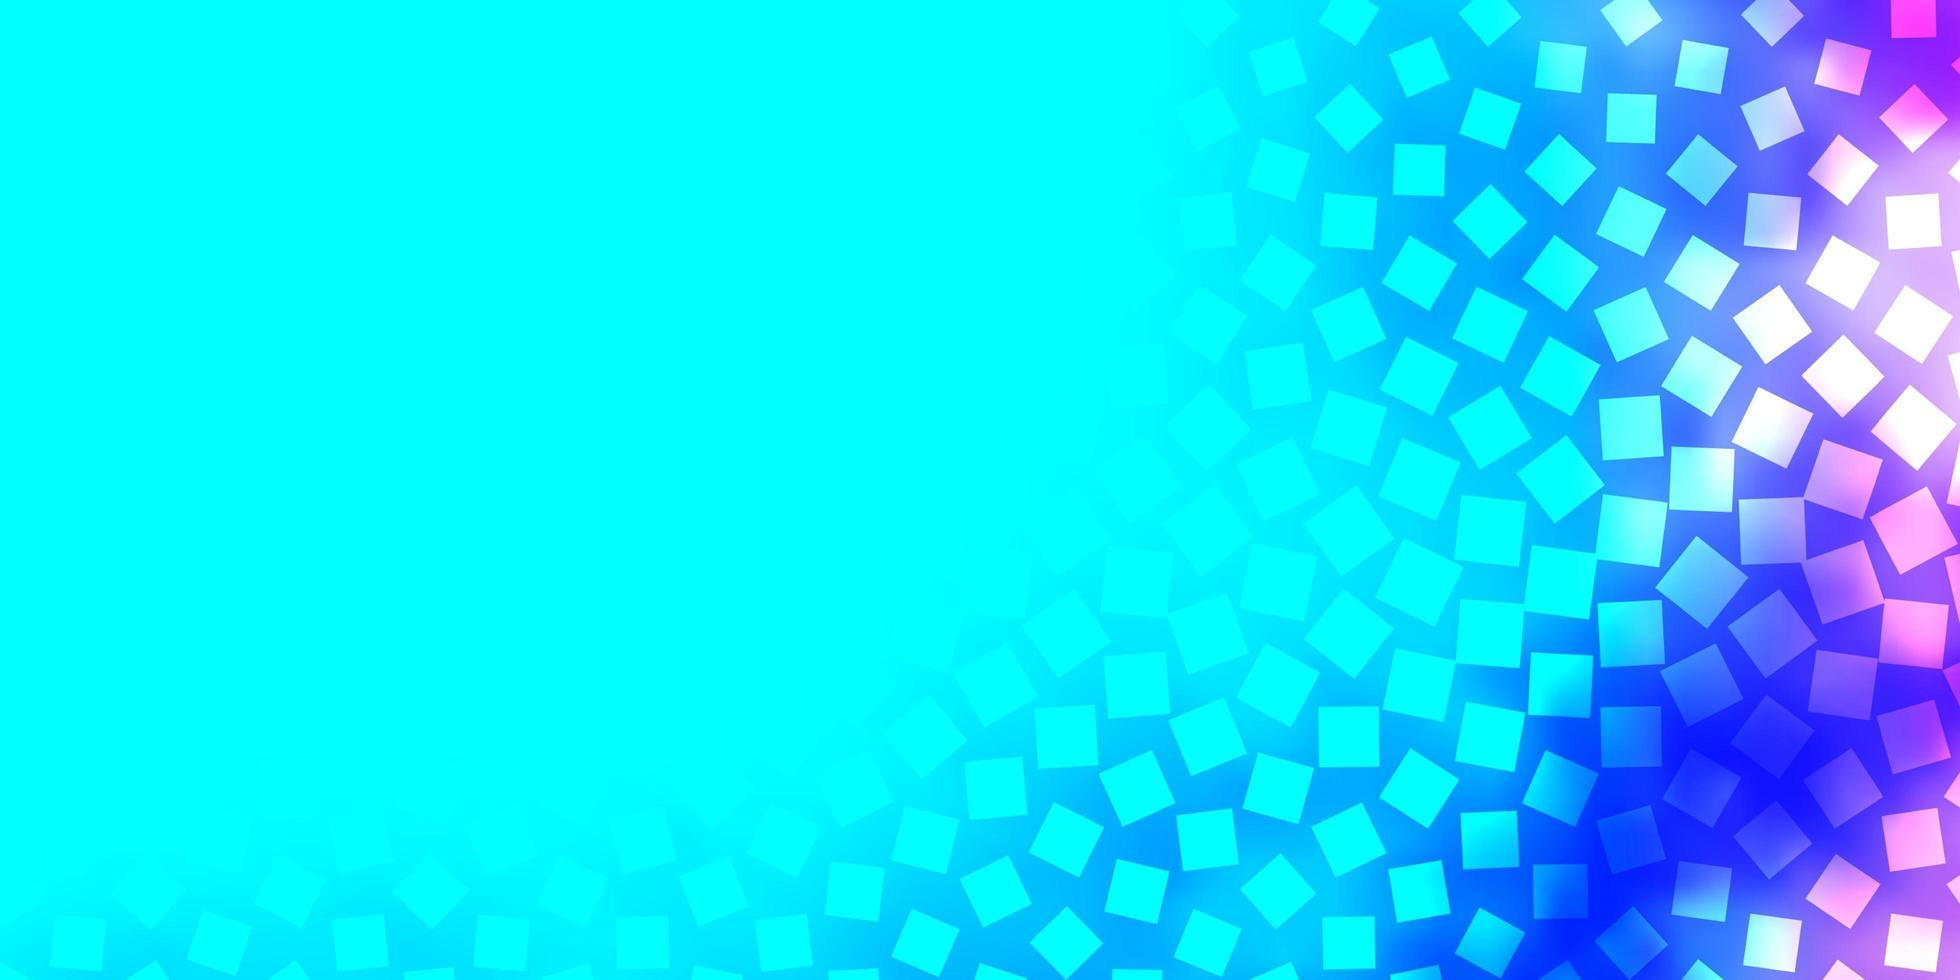 ljusrosa, blå vektorbakgrund med rektanglar. vektor